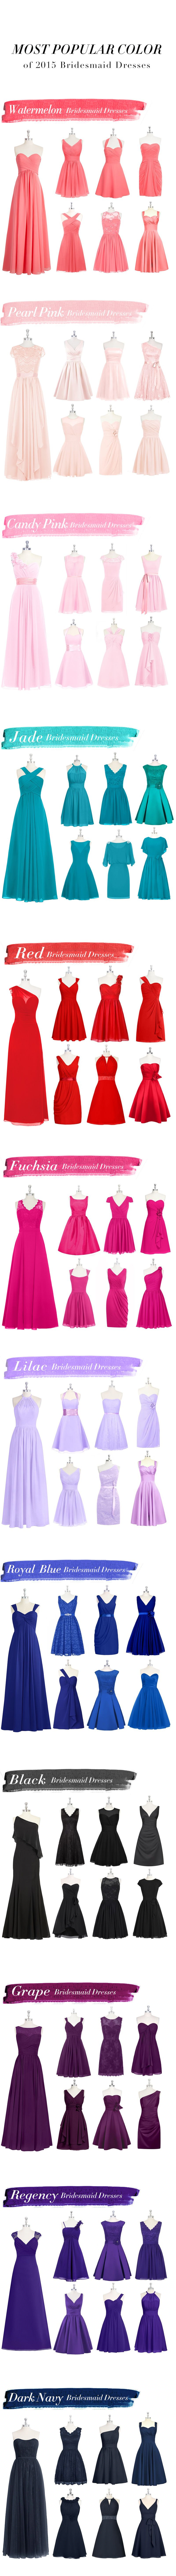 Azazie: Most Popular Bridesmaid Dresses of 2015 | Bridesmaids ...